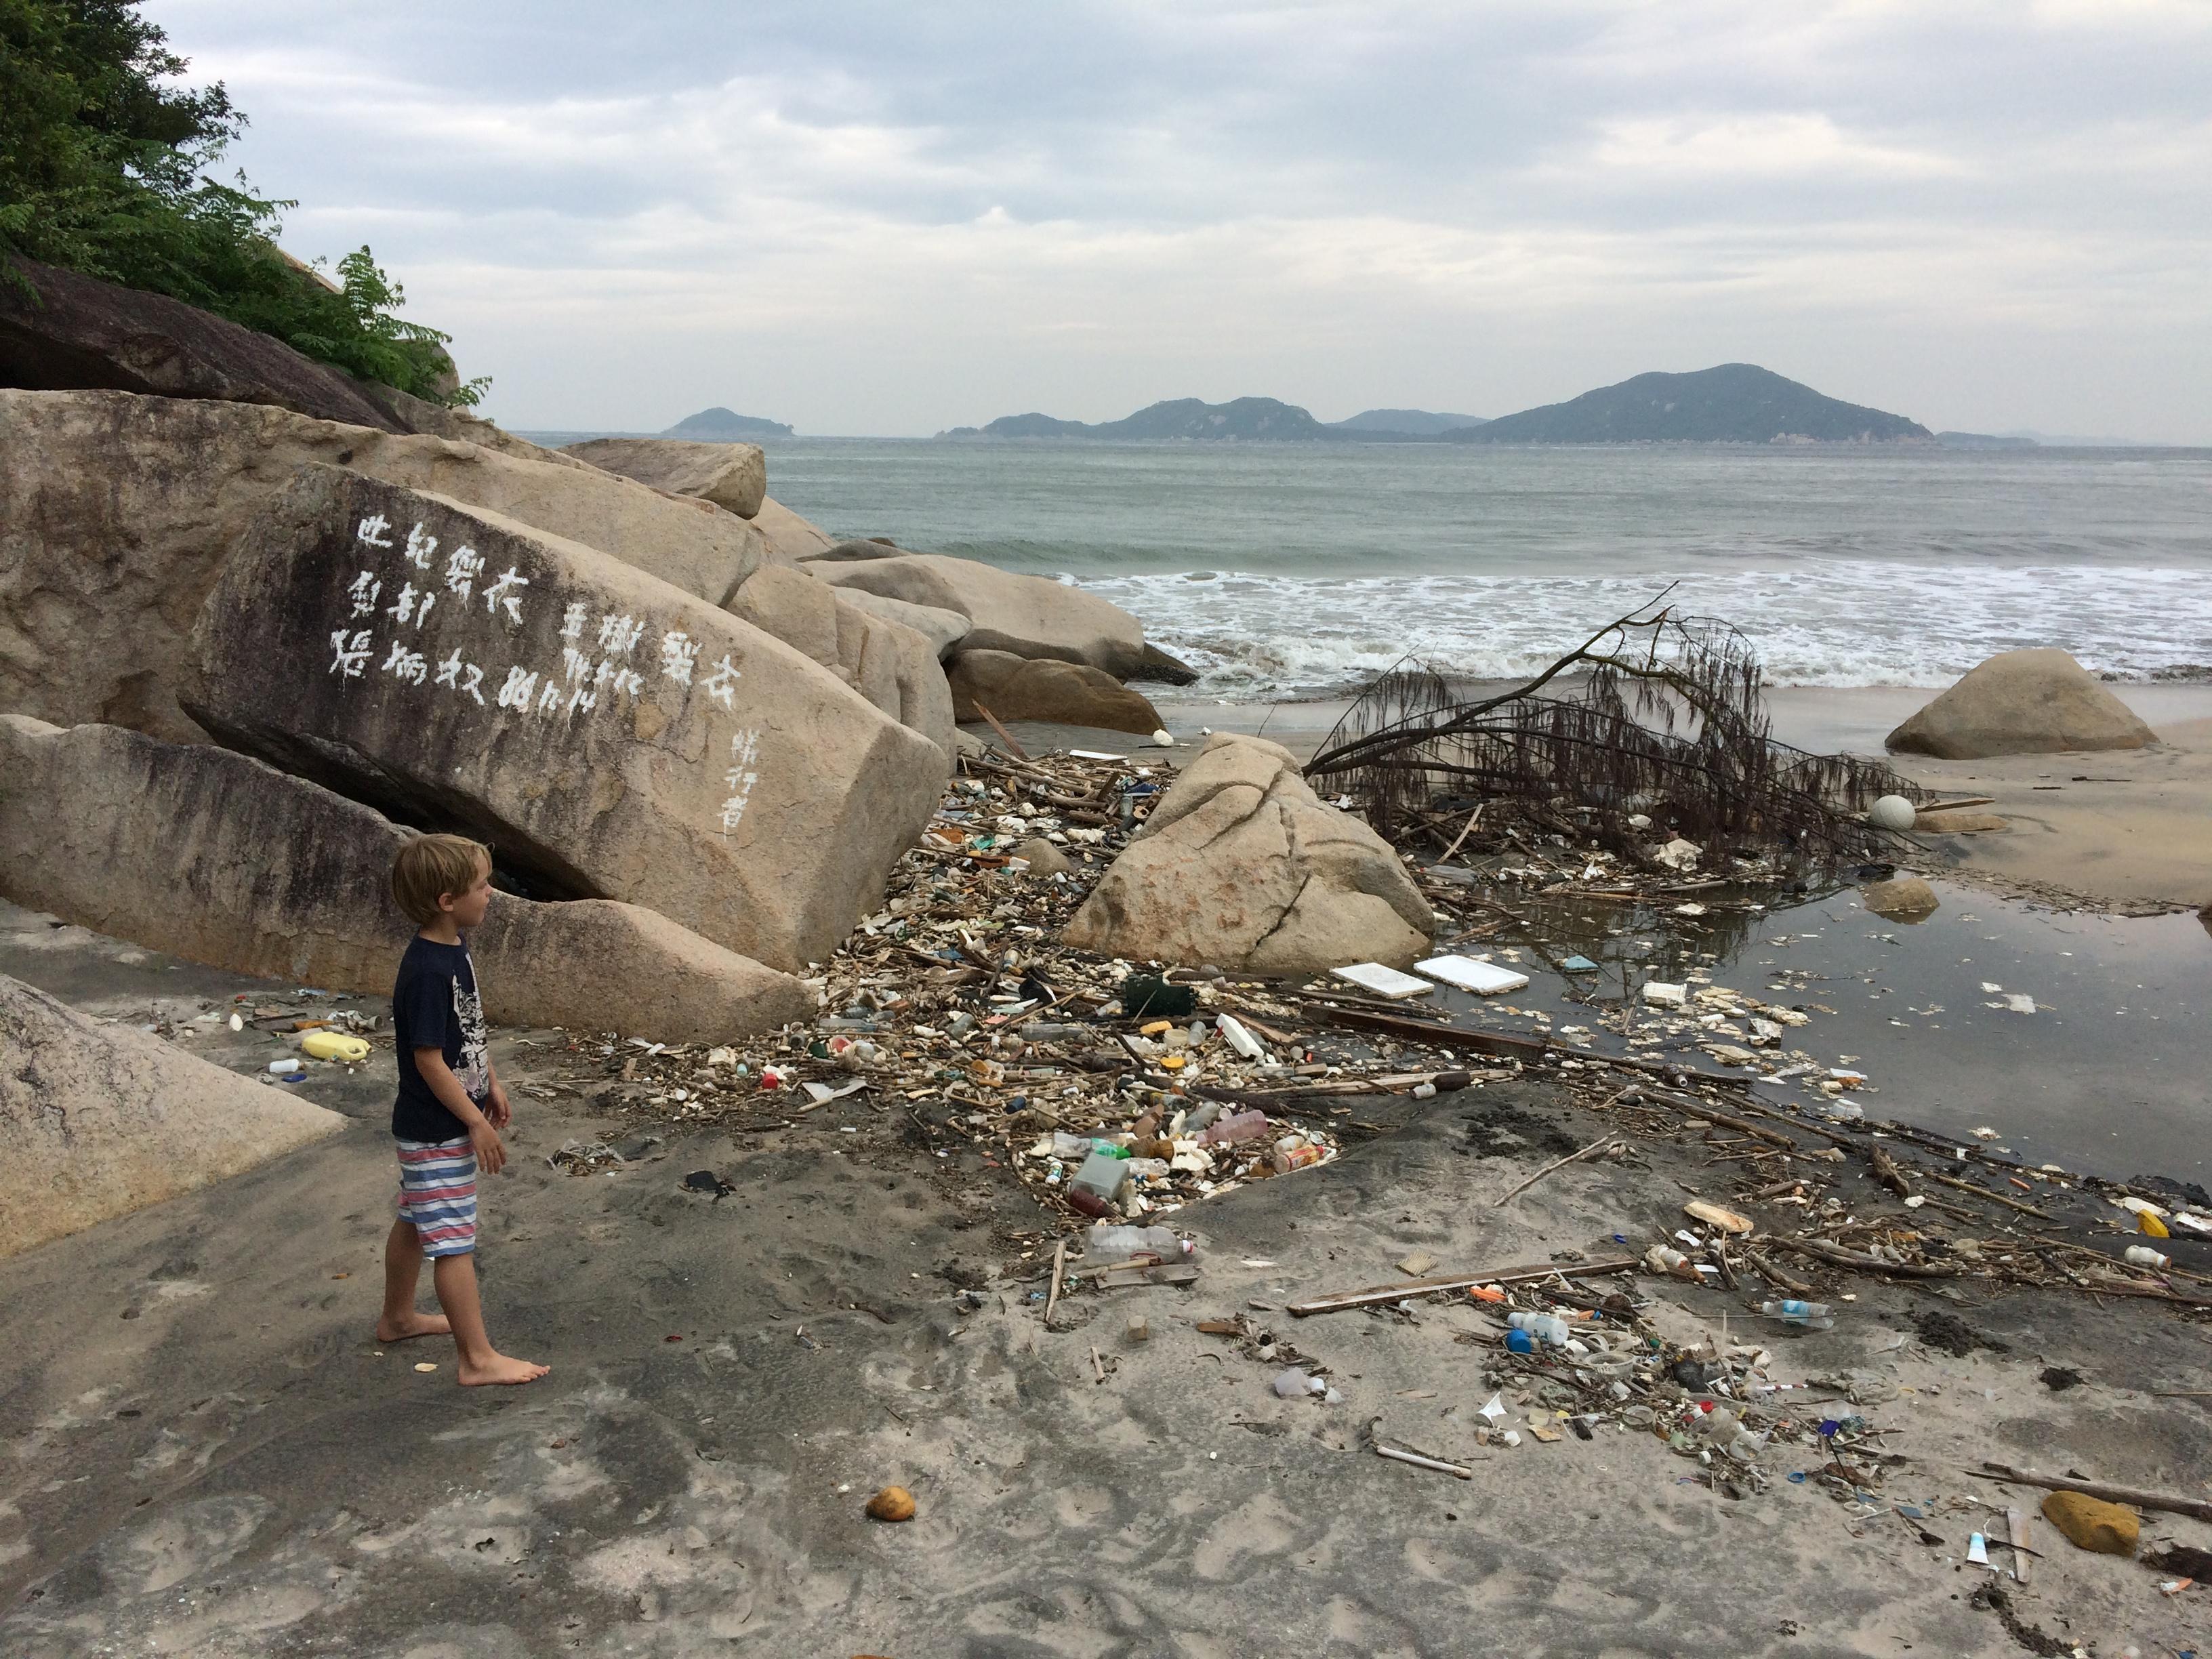 Pollution Lo Kei Wan on Lantau Hongkong